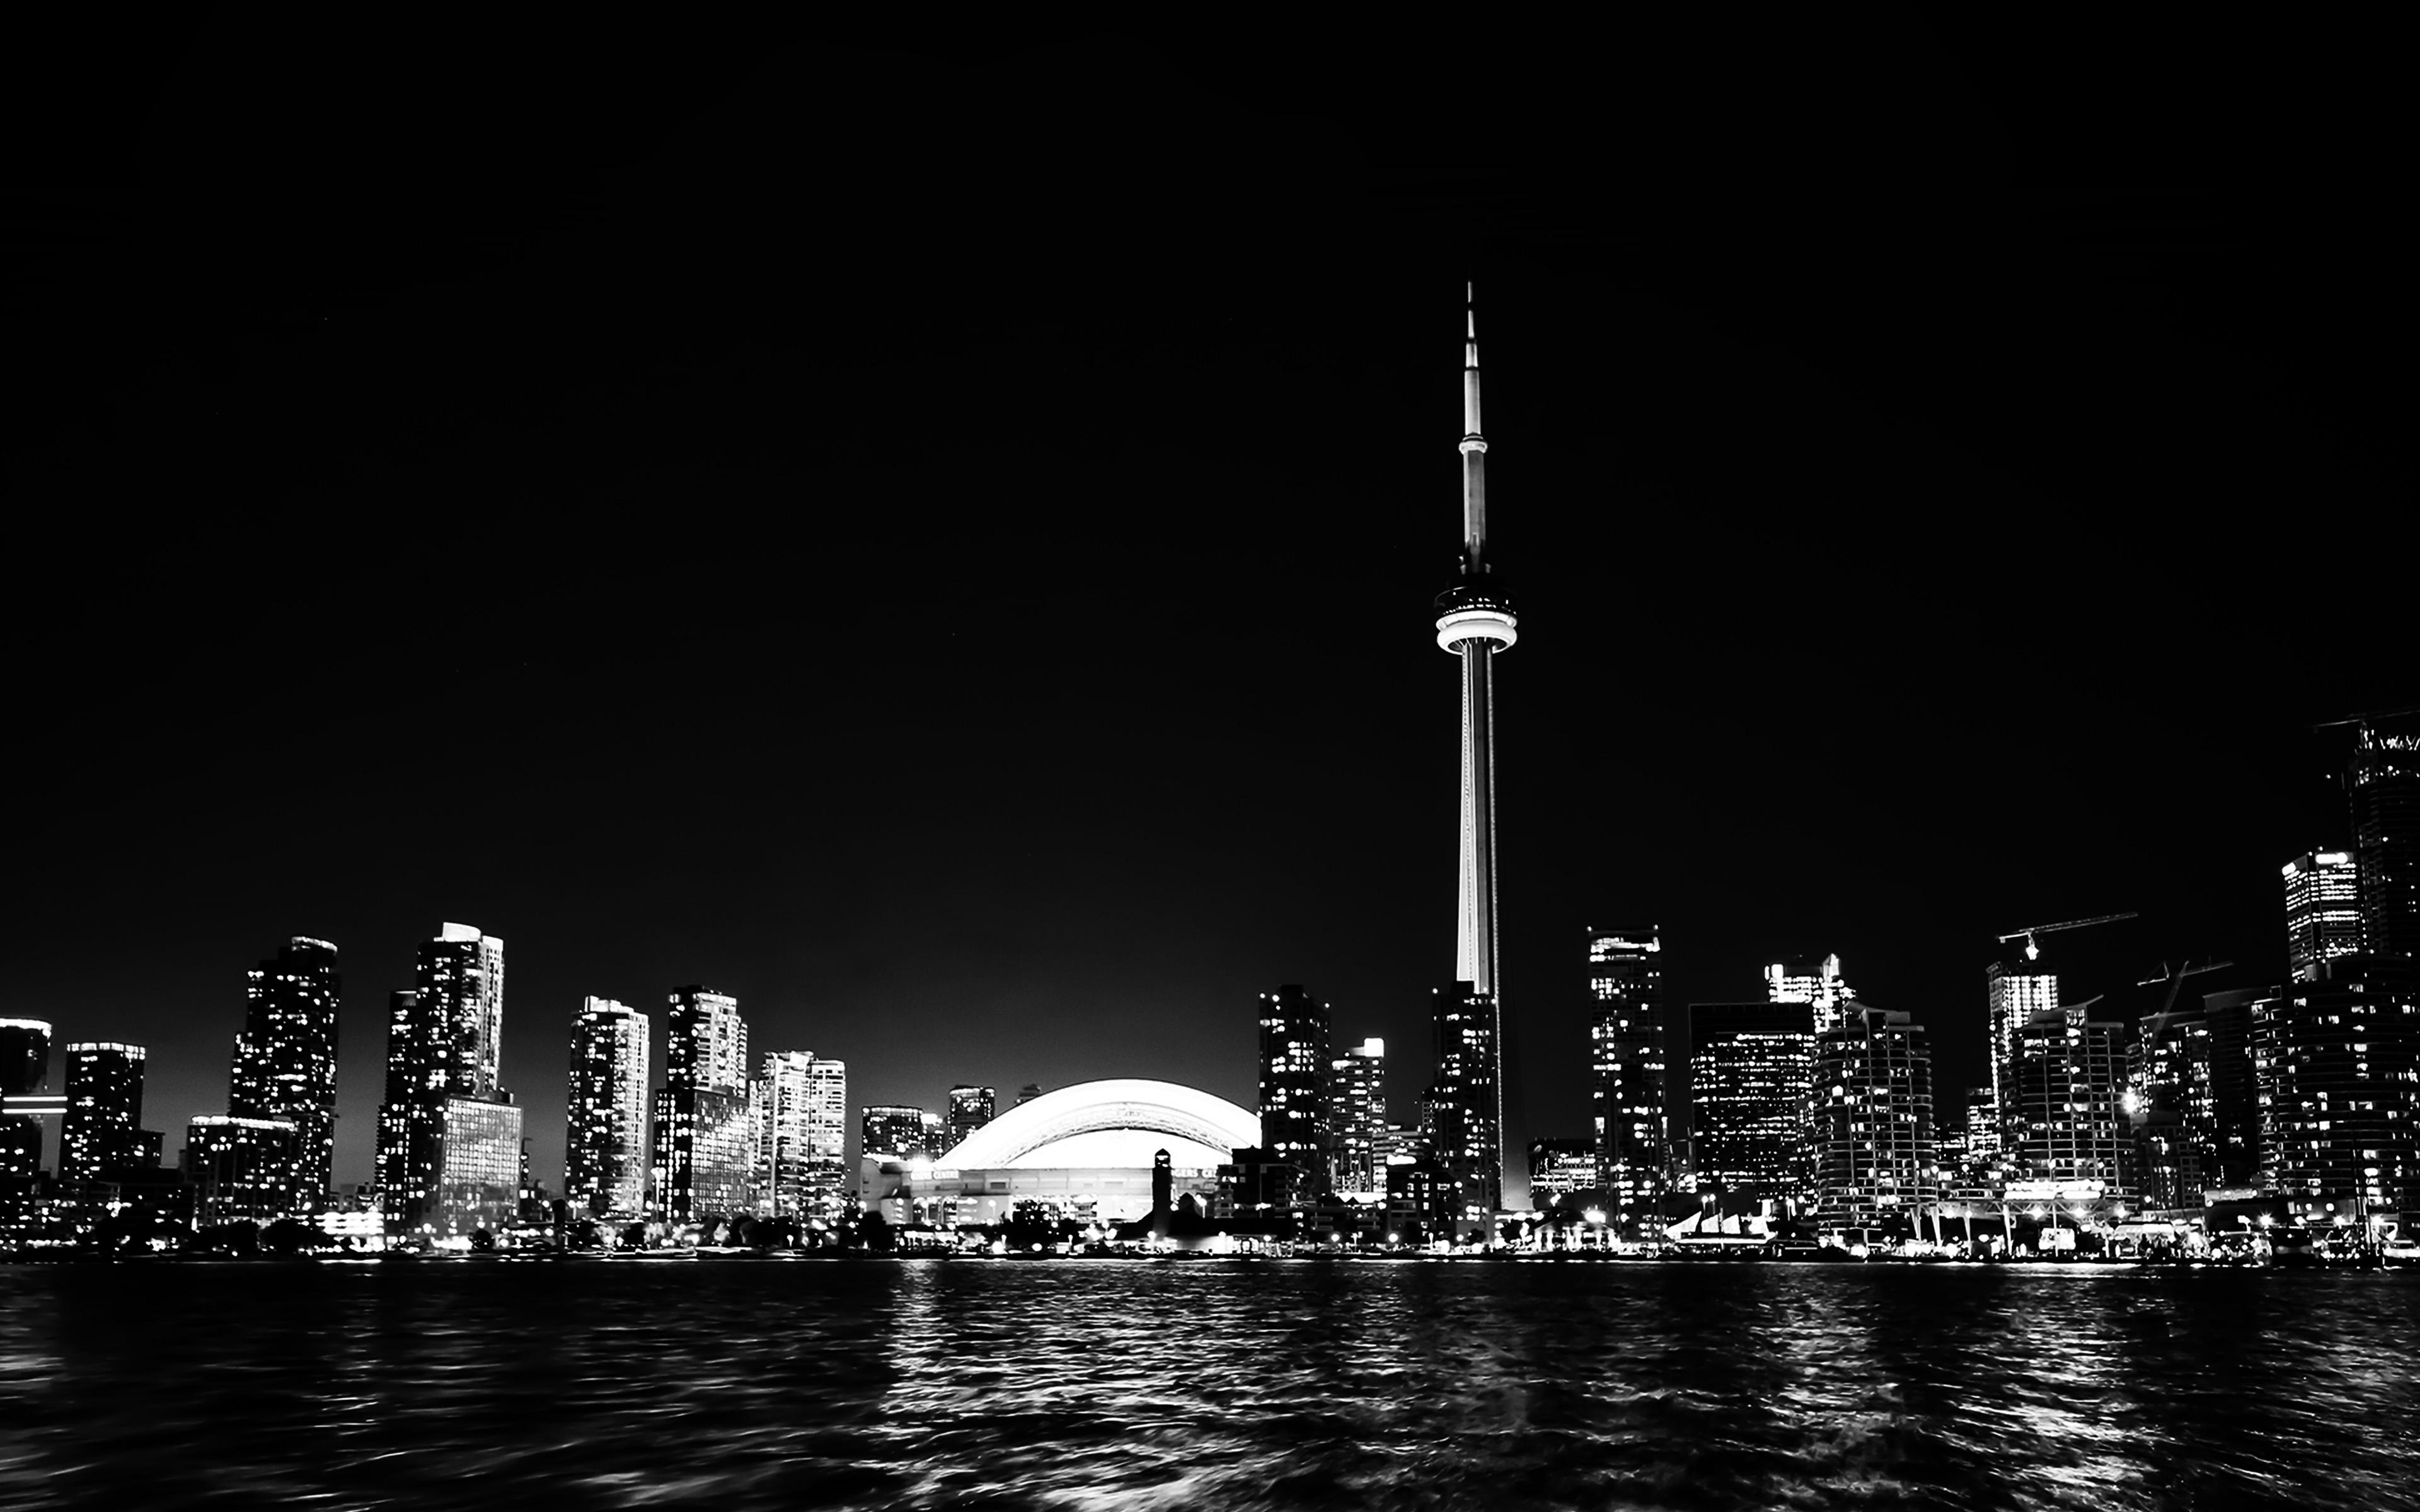 mt45-toronto-city-night-missing-tower-dark-cityview-bw ... Sony Logo Black Background